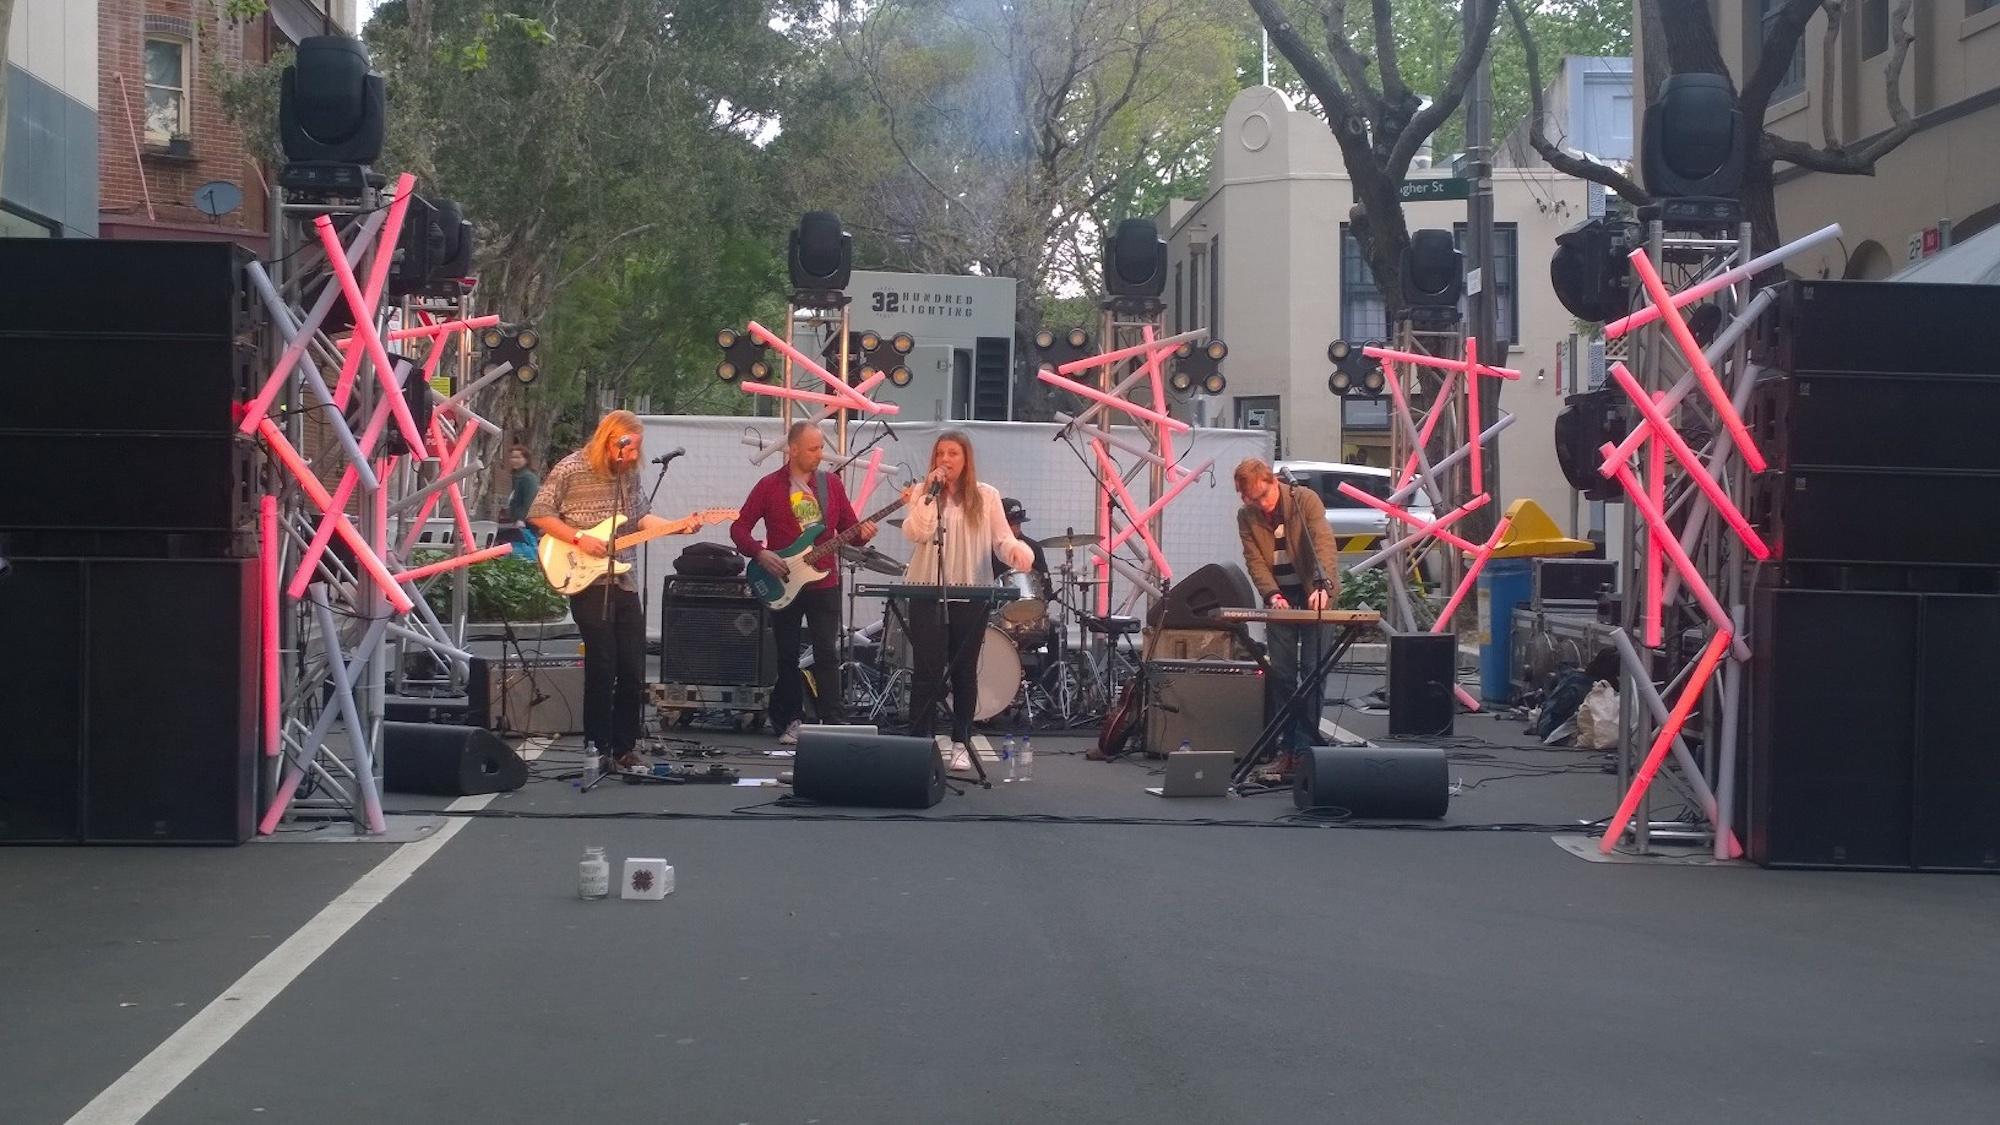 Beams Festival